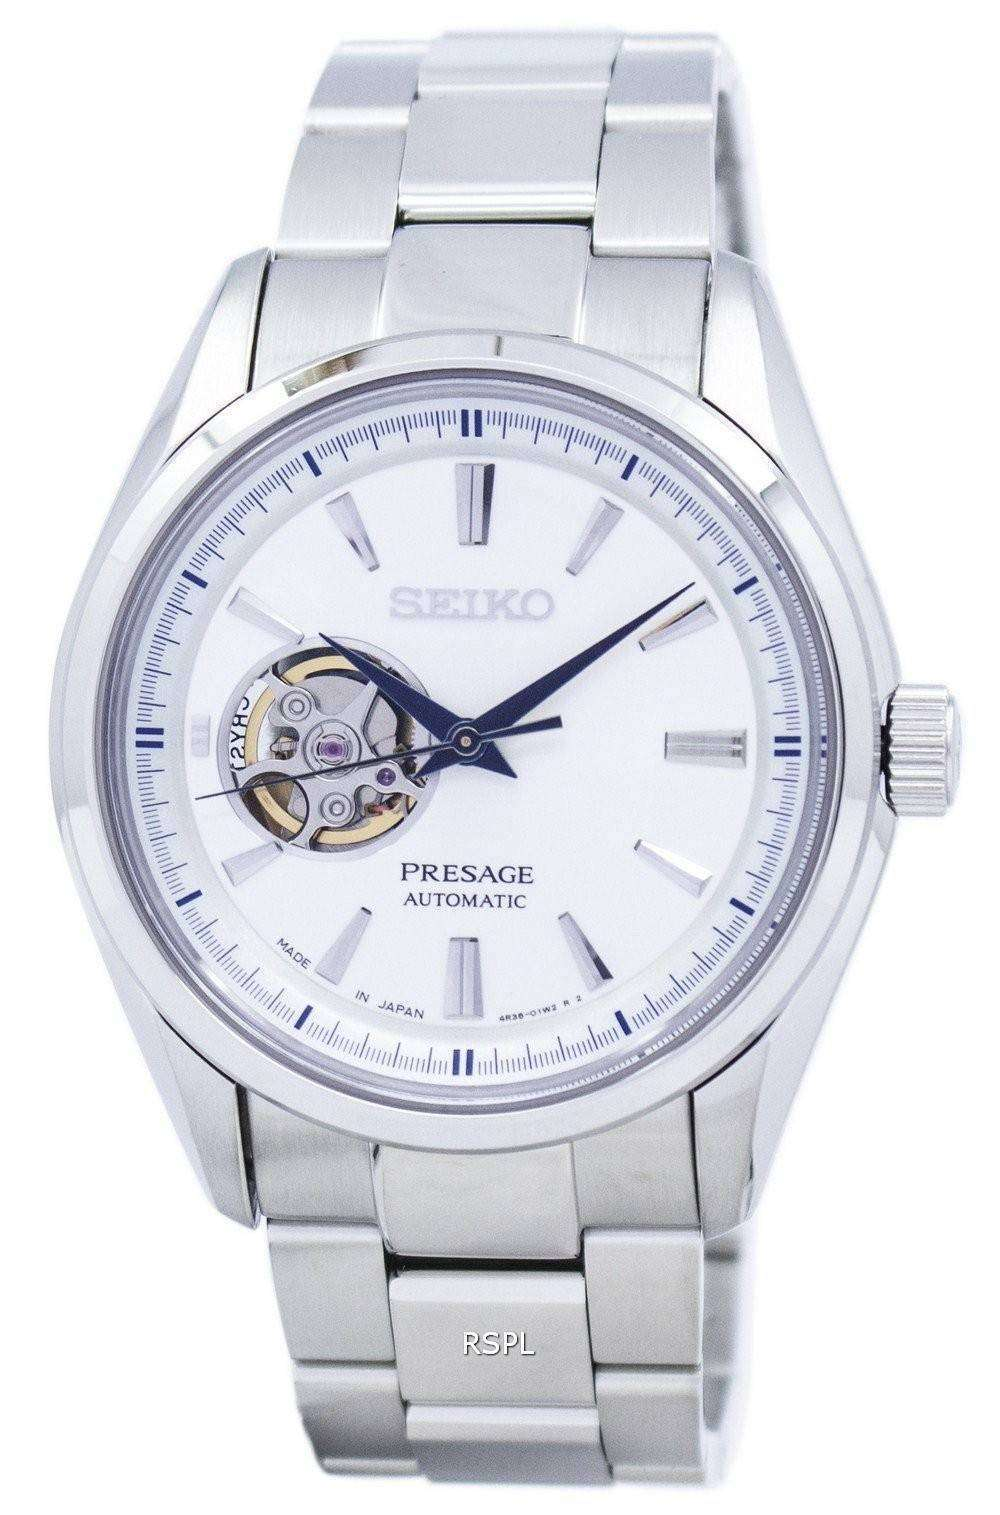 SSA355 SSA355J1 SSA355J メンズ腕時計セイコー プレサージュ自動日本